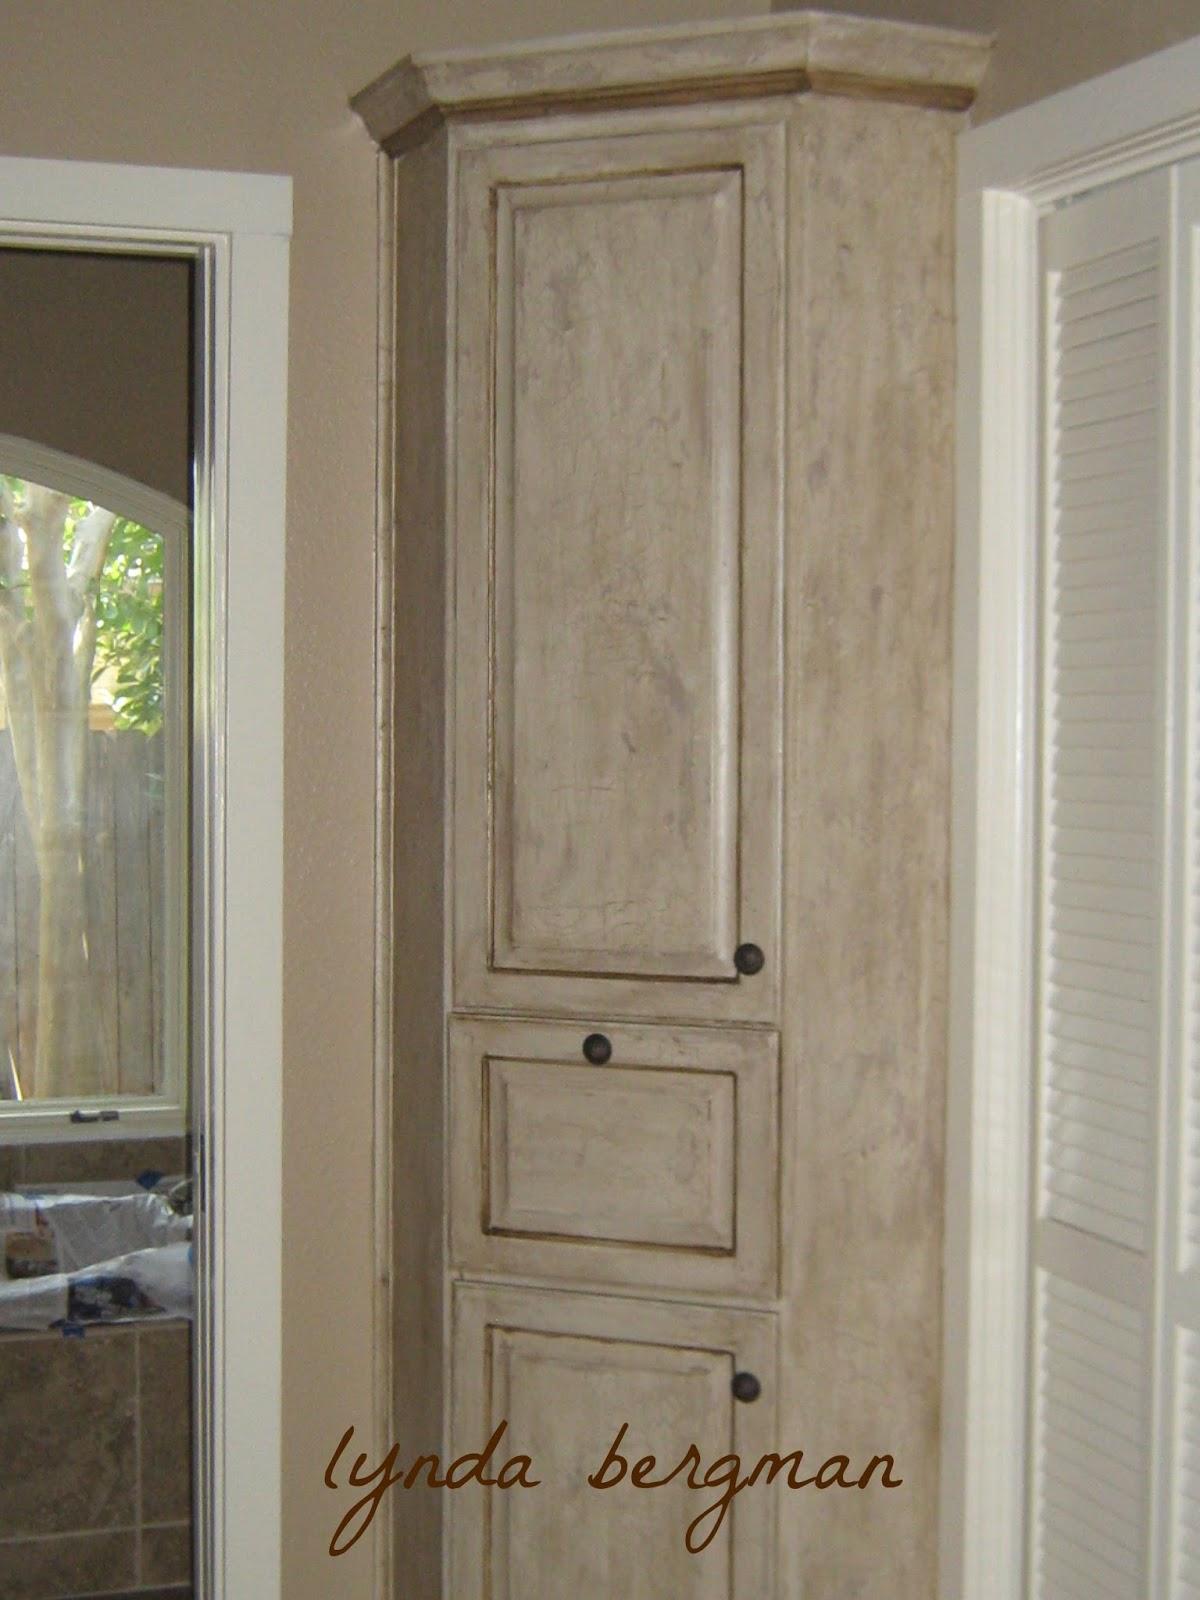 Distressed Bathroom Cabinet Lynda Bergman Decorative Artisan Distressed Faux Finish On